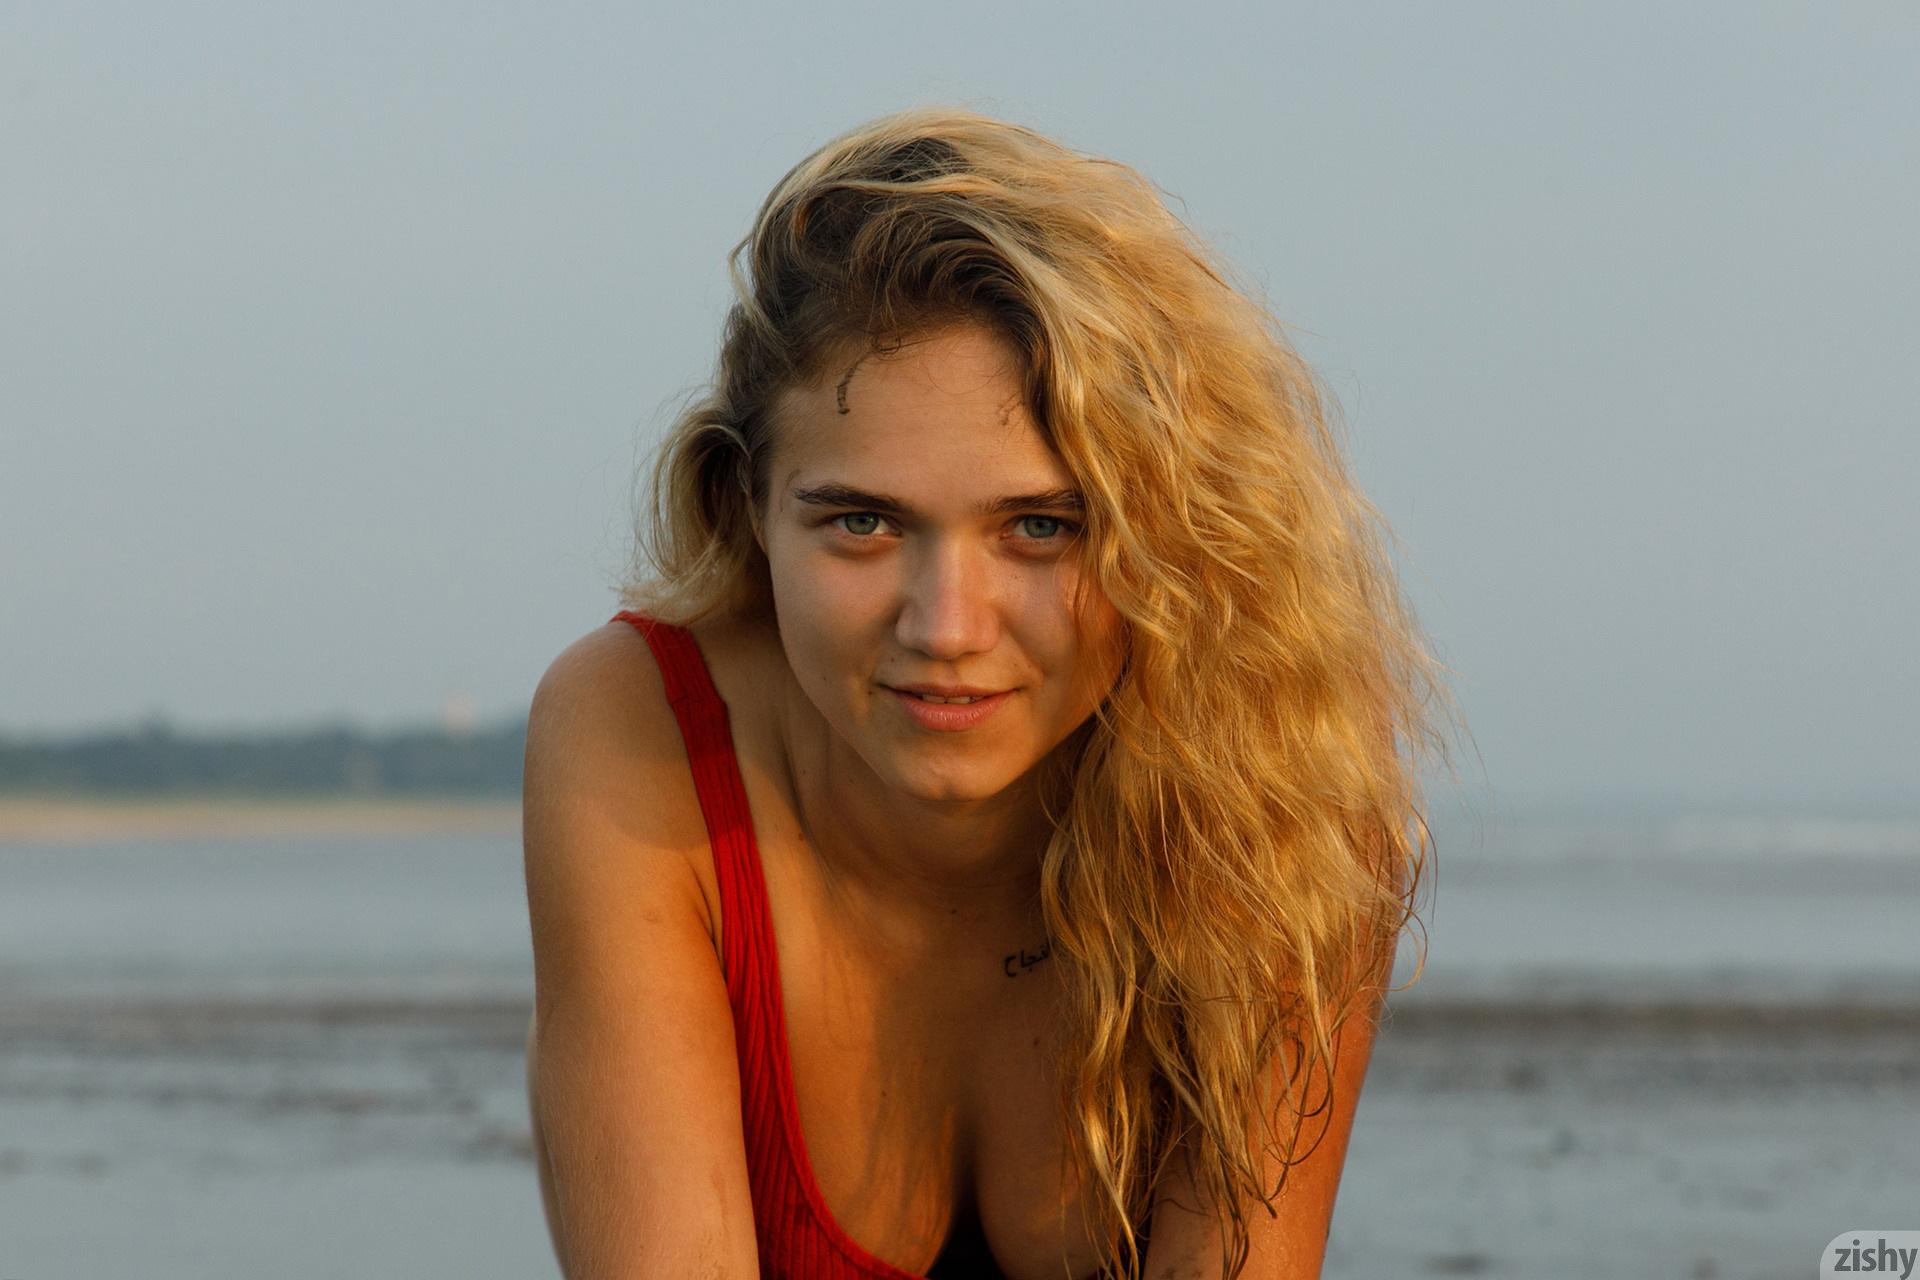 Sofia Orlova On Gryaznyy Beach Zishy (29)